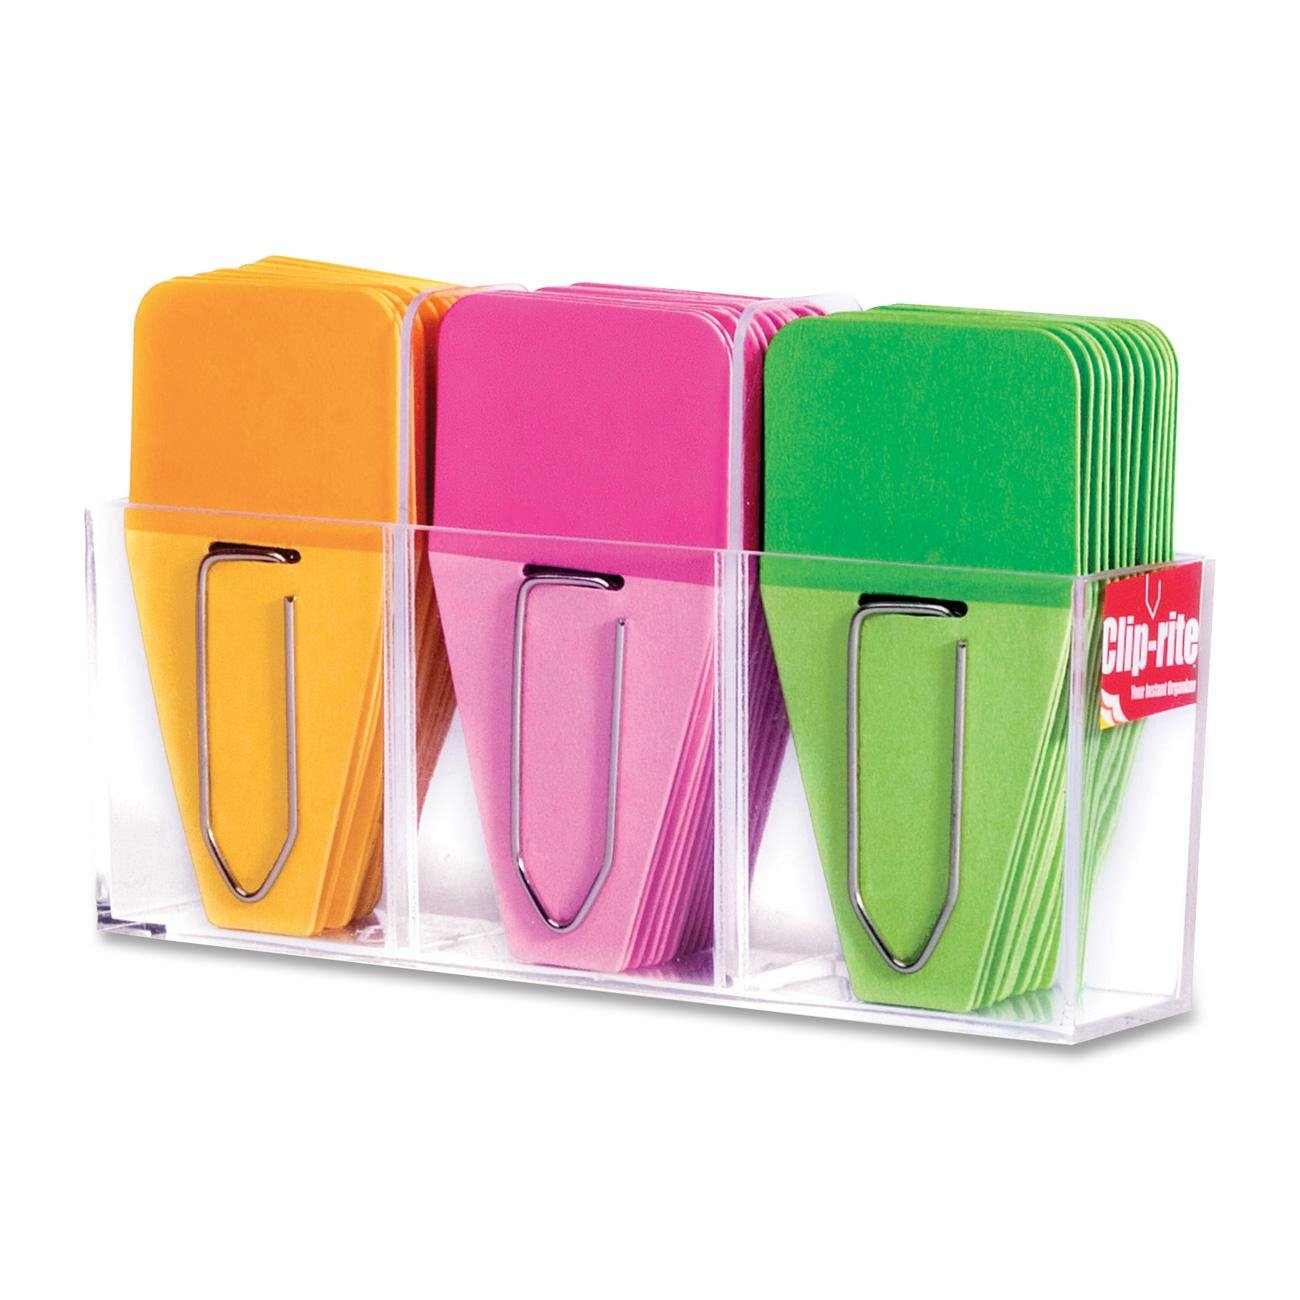 Clip-rite Clip-Tabs Small Solid O/P/G 12 Clip-Tabs per color Dispenser included 36 pieces (CRT-009 )